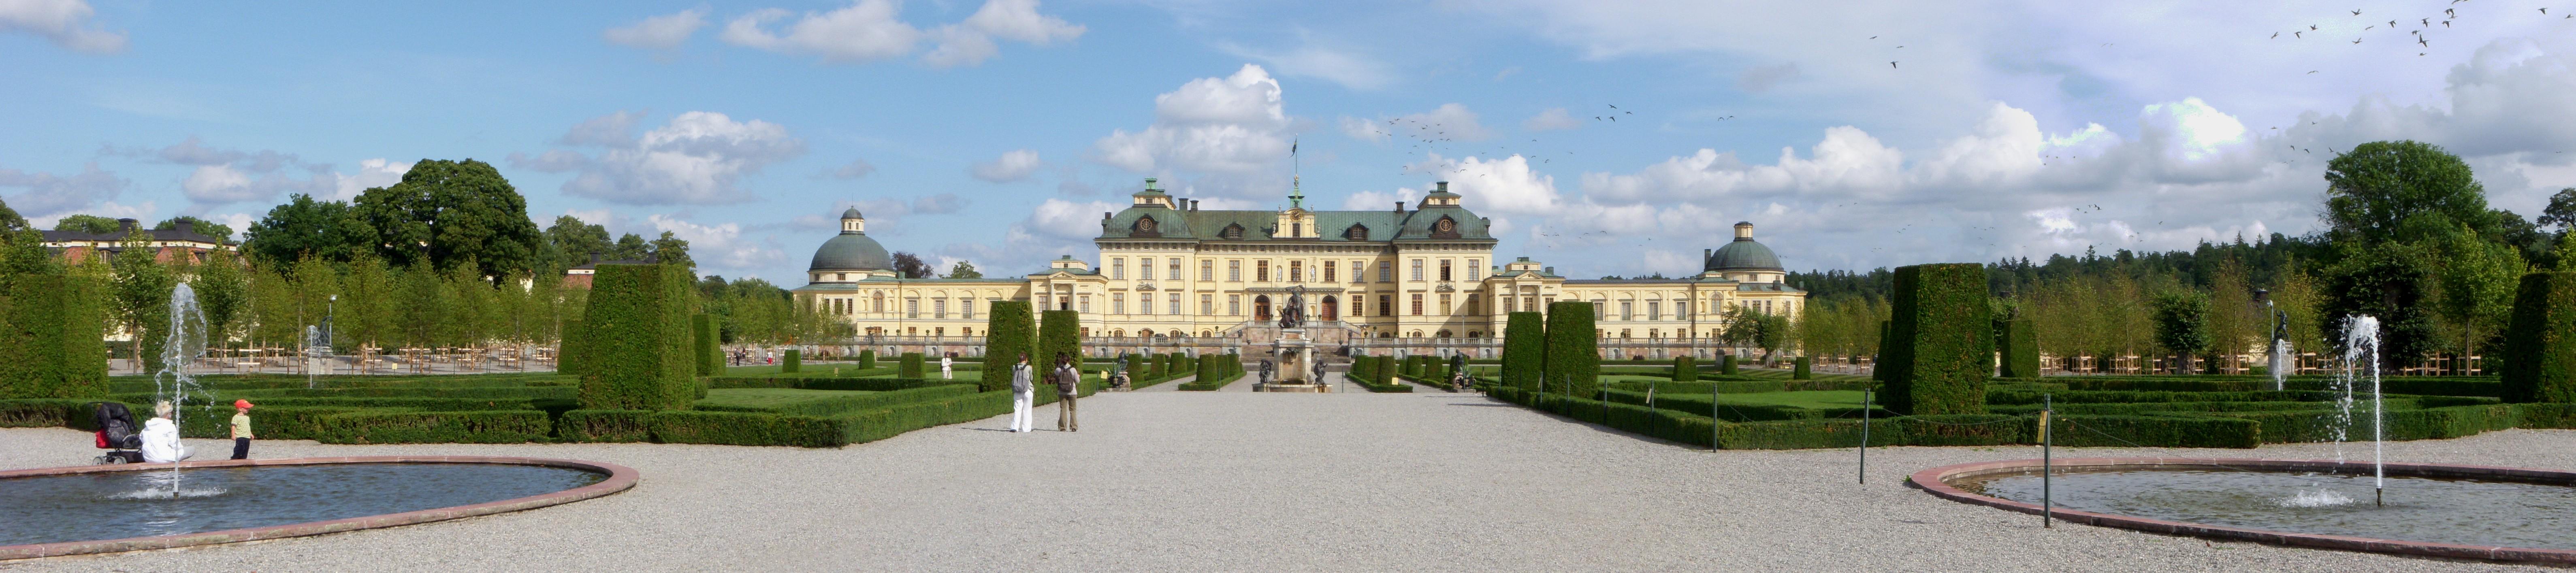 Drottningholms_slott_panorama_2011.jpg